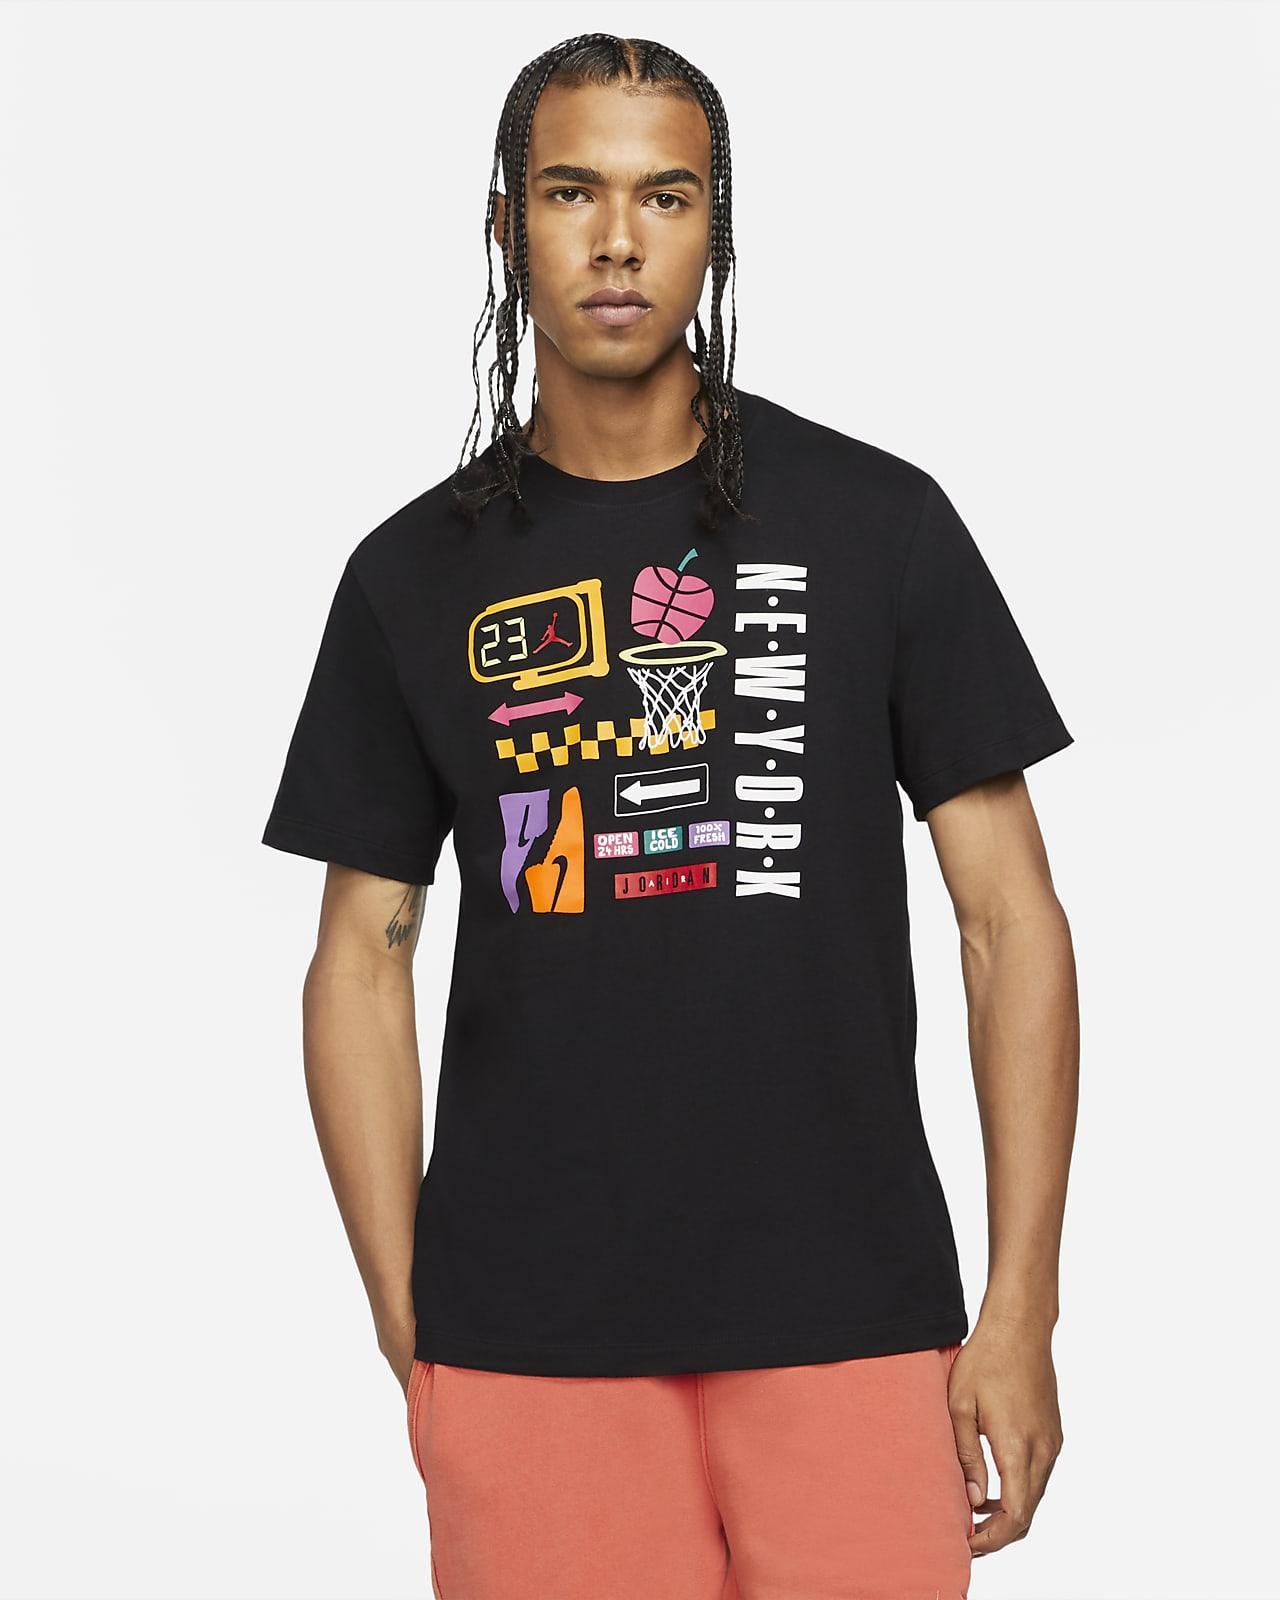 Jordan New York Men's Short-Sleeve T-Shirt